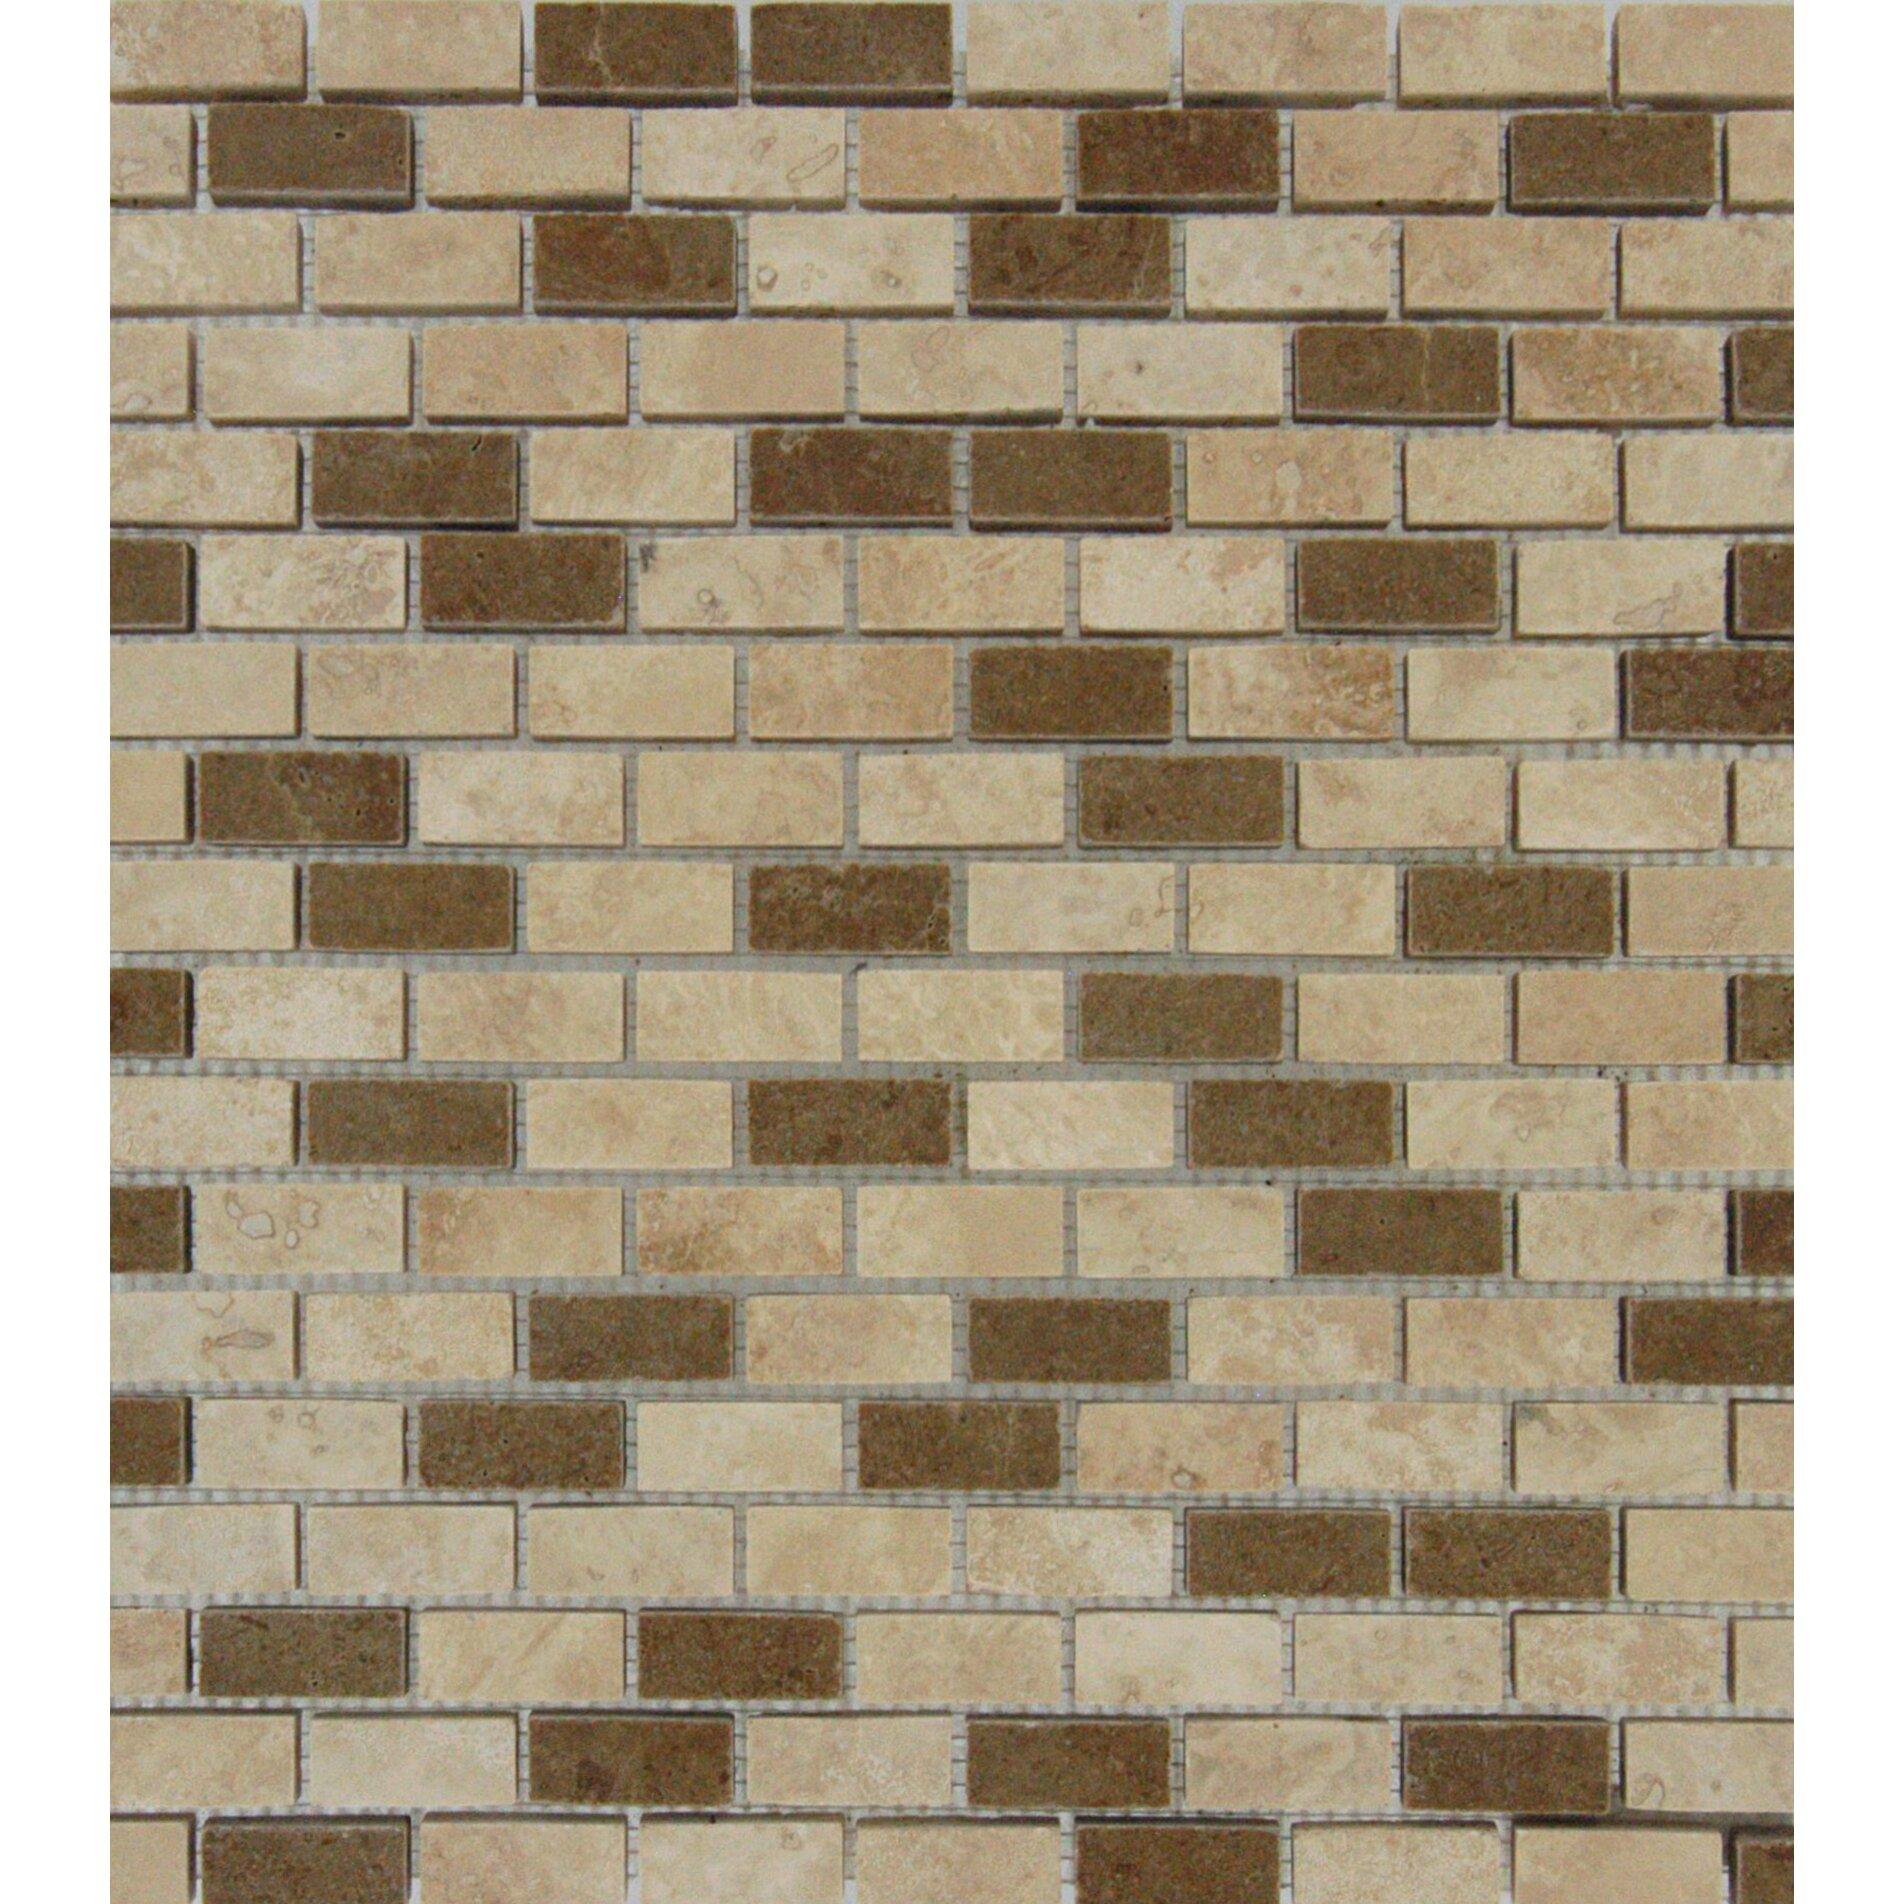 13x13 Marfil Chiaro Tile Ms International Honed Noce Chiaro Mini Brick Mesh